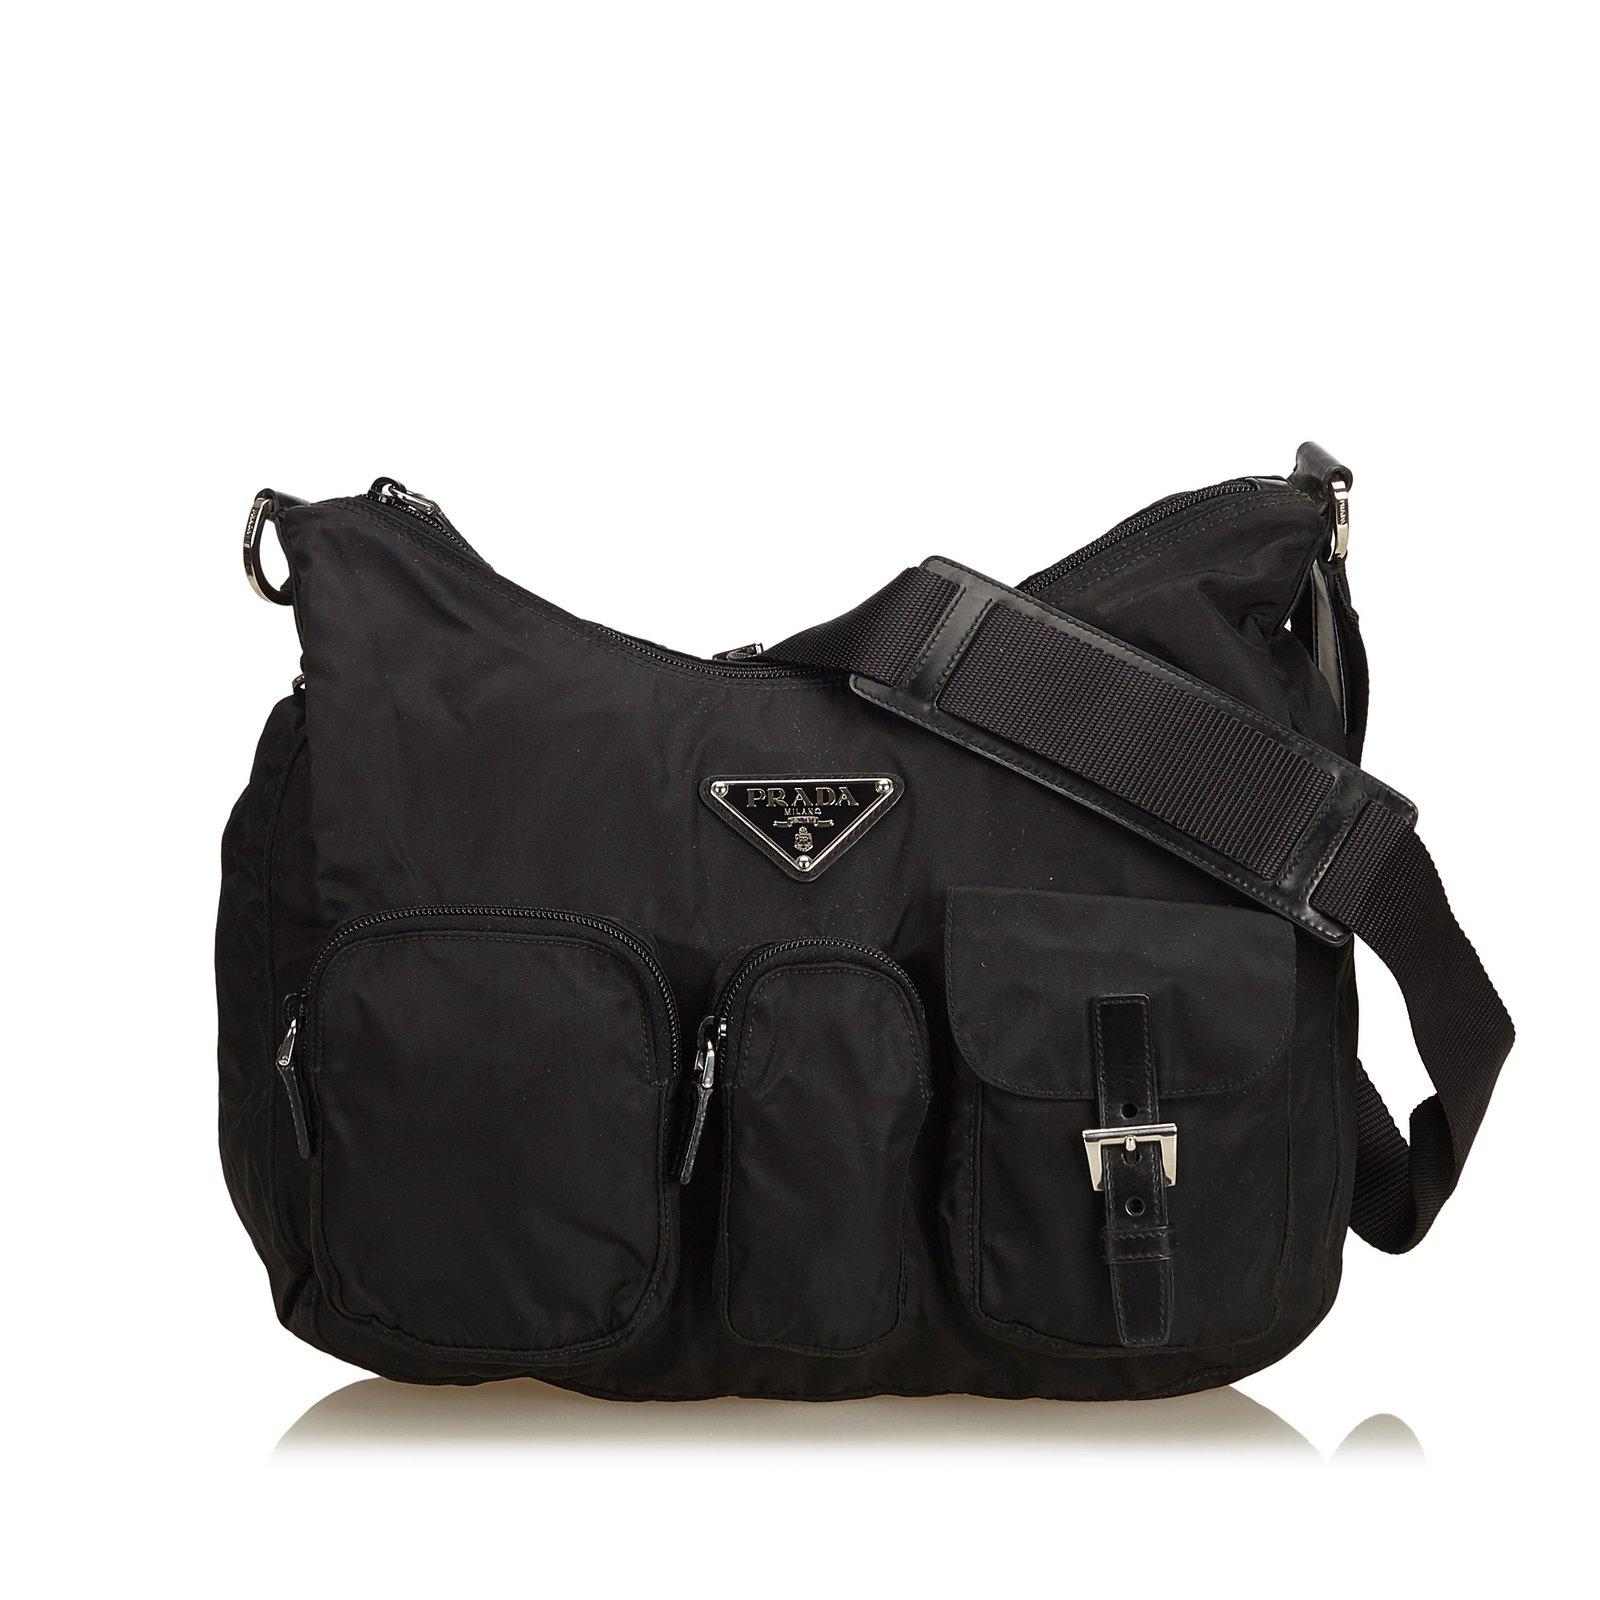 845331724111 Prada Nylon Crossbody Bag Handbags Nylon,Cloth Black ref.106043 ...